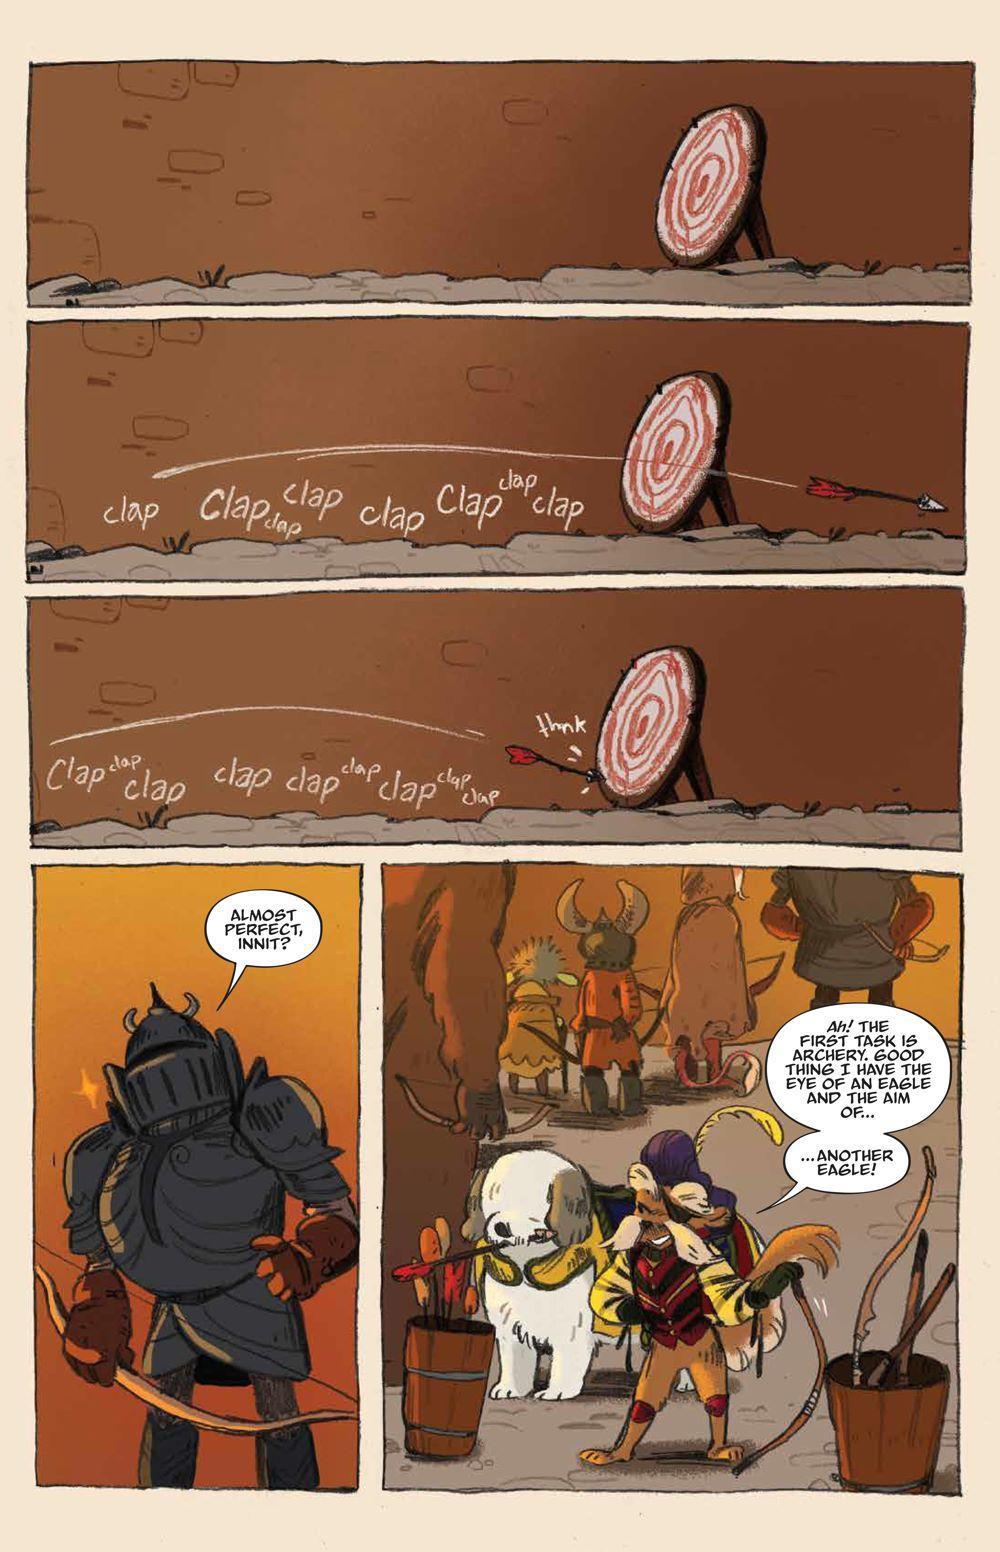 Labyrinth_UnderSpell_HC_PRESS_17 ComicList Previews: JIM HENSON'S LABYRINTH UNDER THE SPELL HC